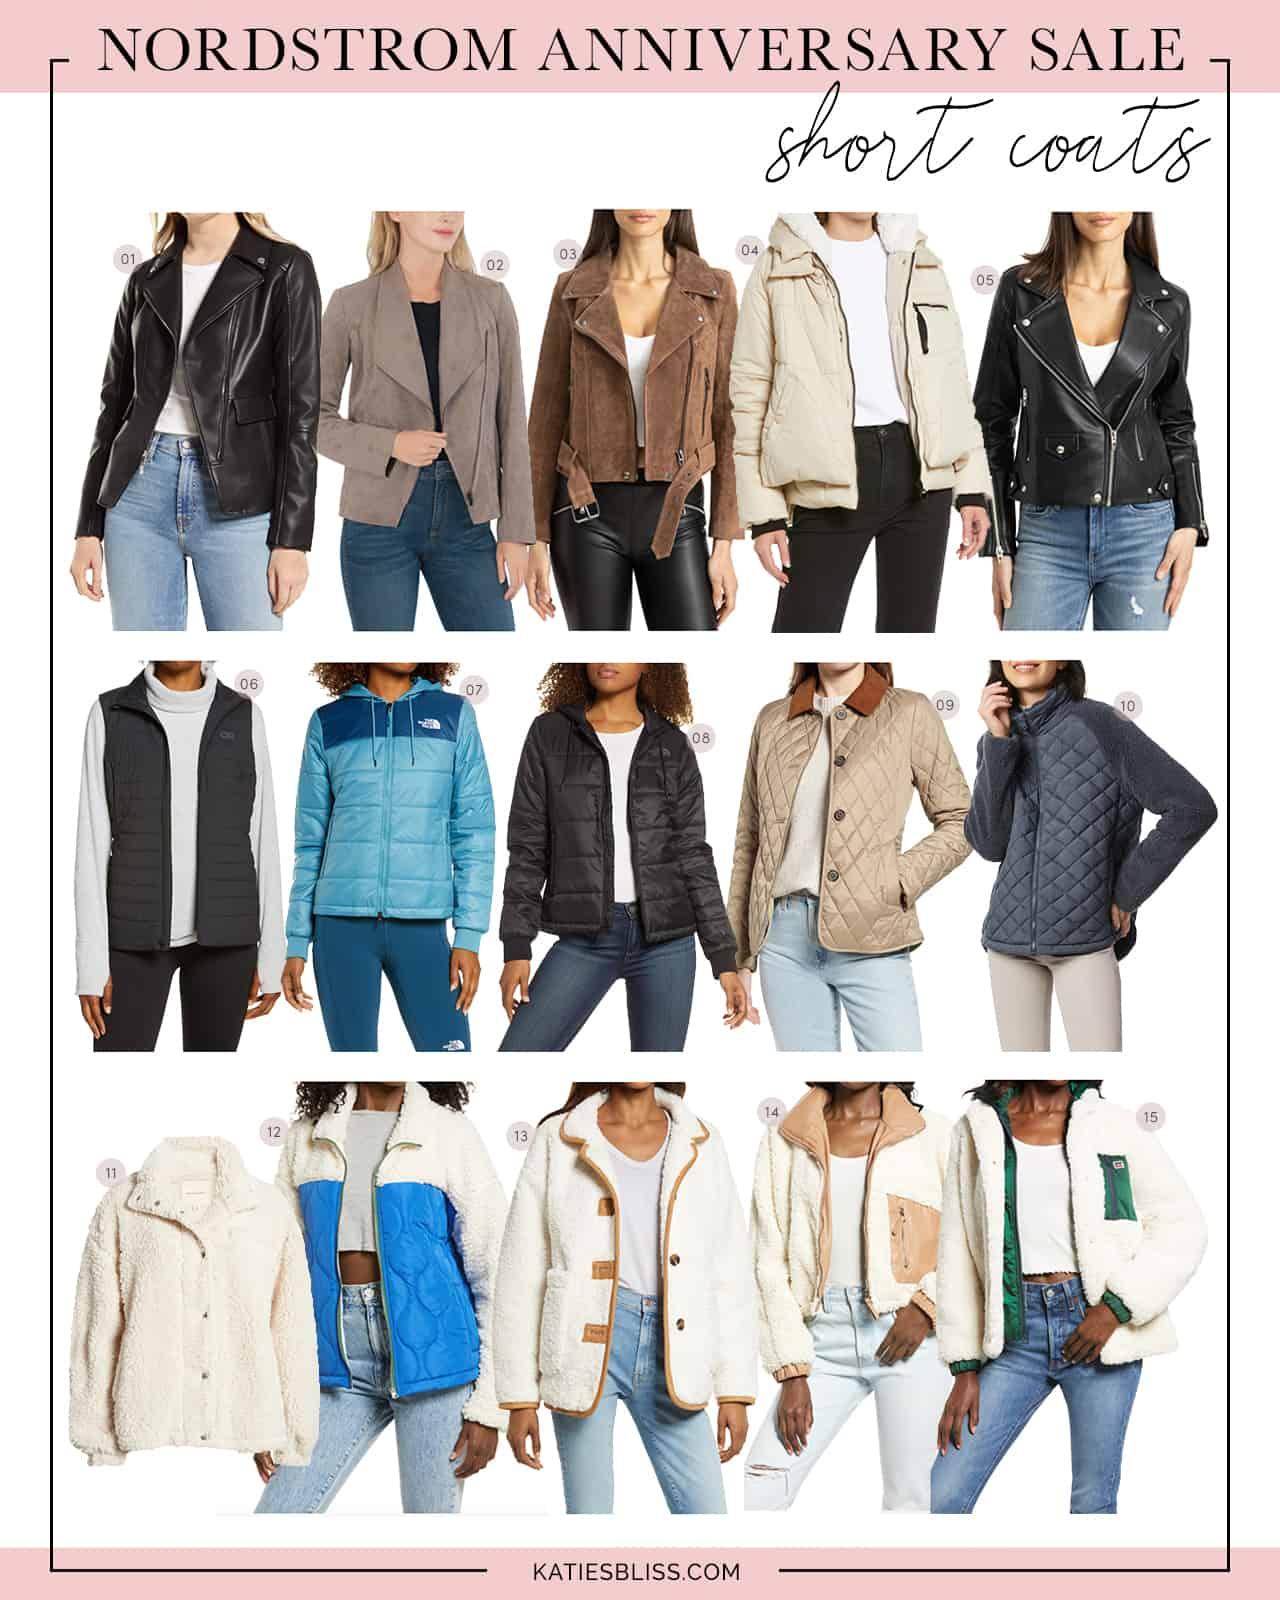 Nordstrom Anniversary Sale Short Coats